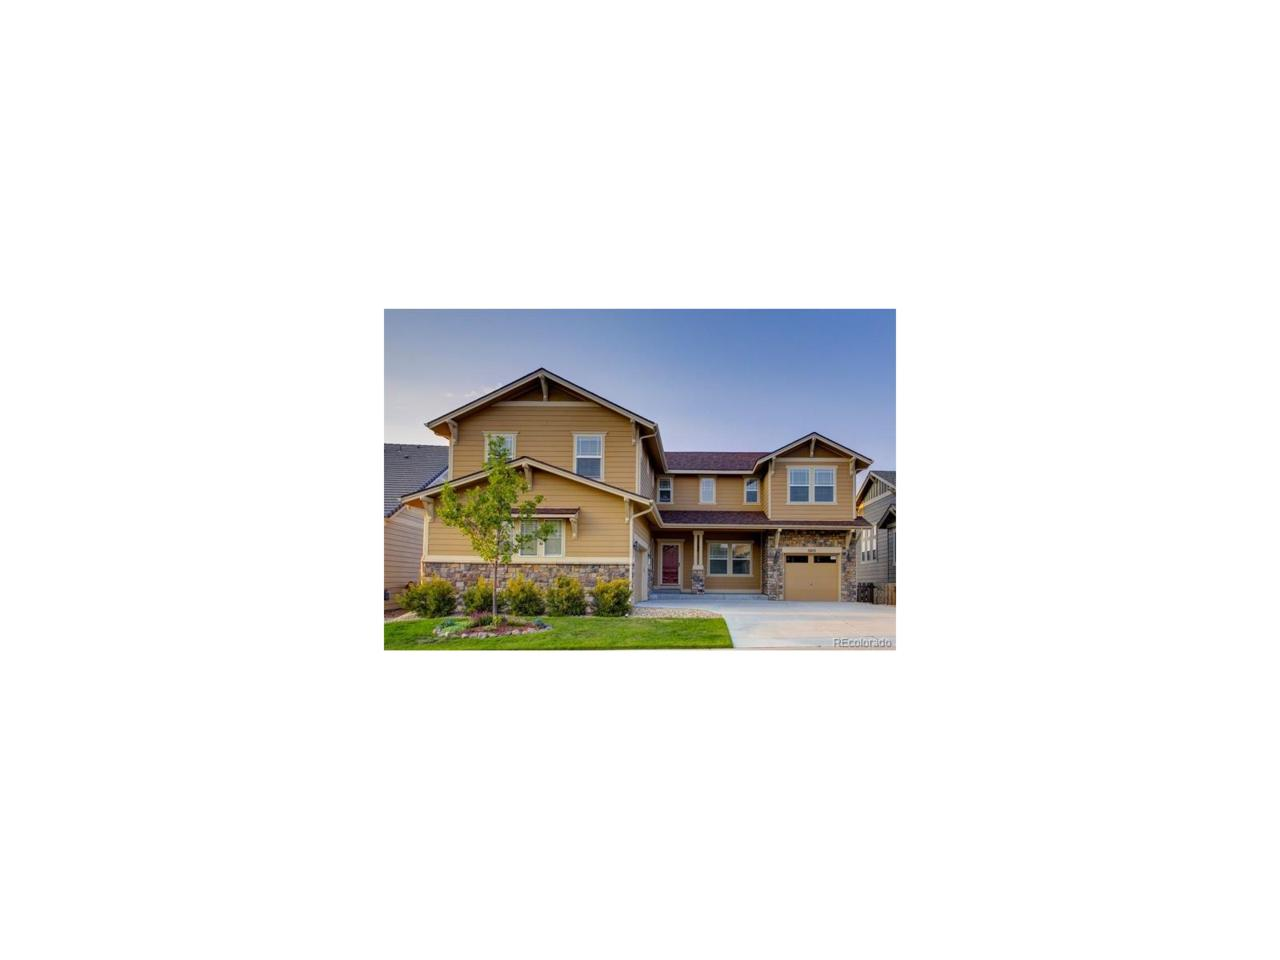 5215 Gould Circle, Castle Rock, CO 80109 (MLS #7283589) :: 8z Real Estate